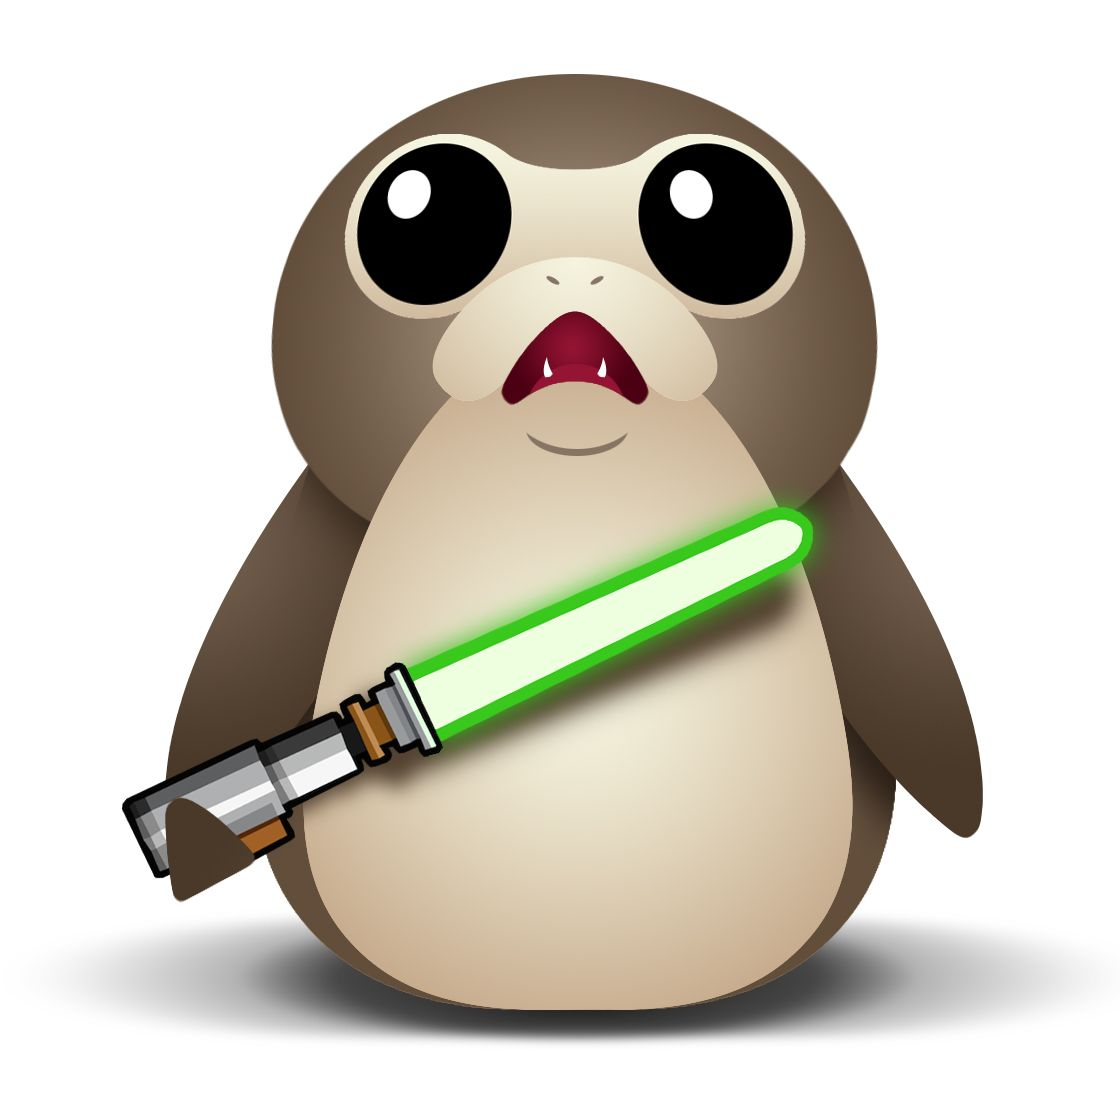 Jedi Porg - lightsabercollection.com mascot #jediporg | Star Wars ...